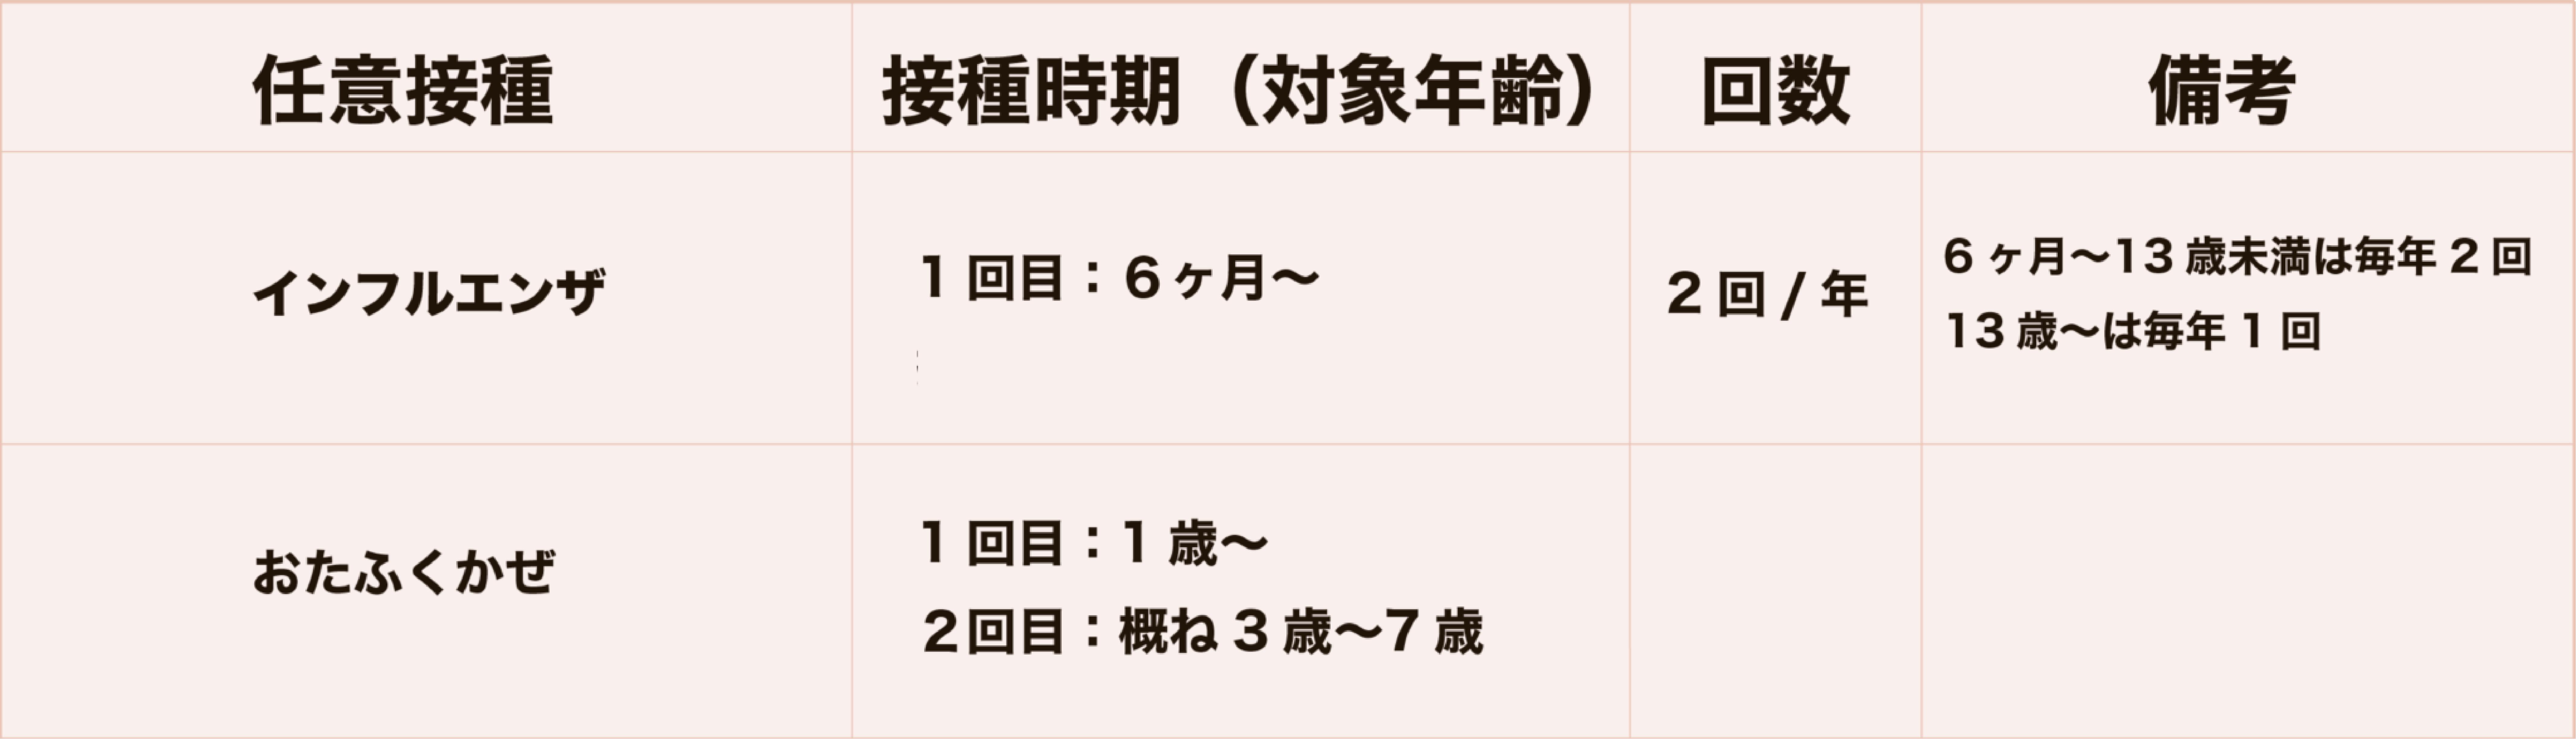 "dddd 02 - <span style=""font-family: serif;"">小児科"